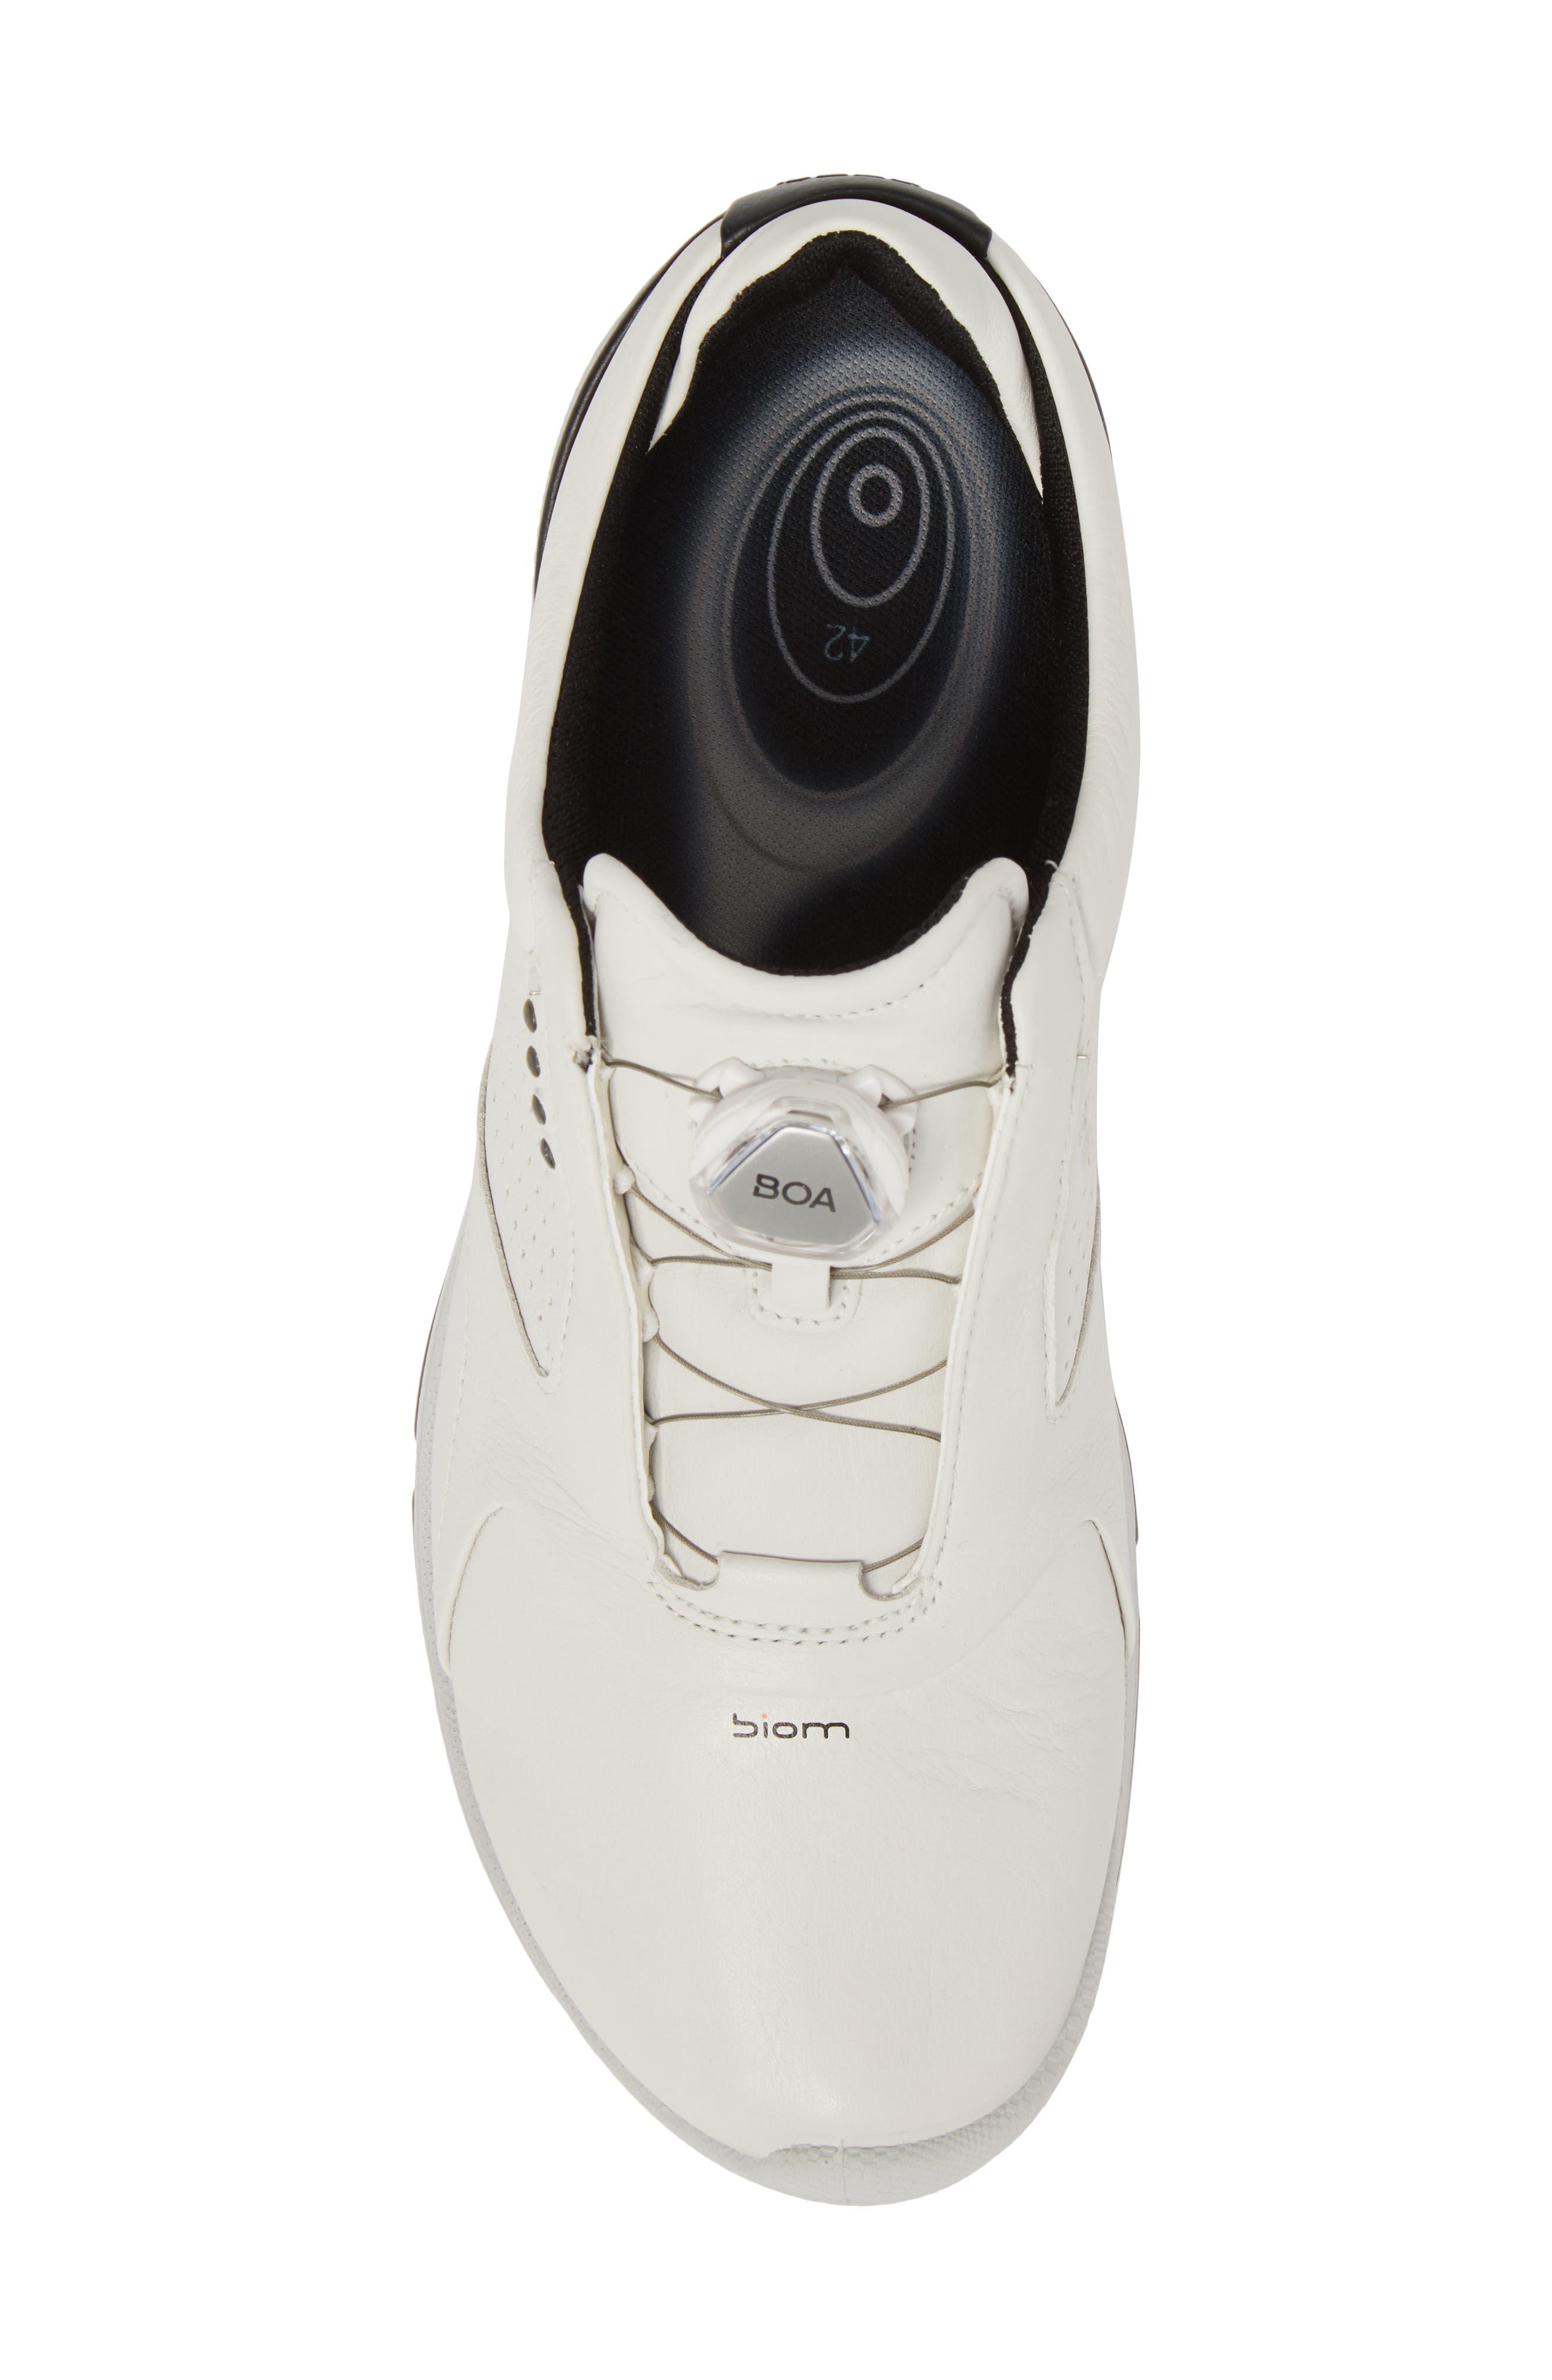 BIOM 2 BOA Gore-Tex<sup>®</sup> Golf Shoe,                             Alternate thumbnail 5, color,                             WHITE/ BLACK LEATHER